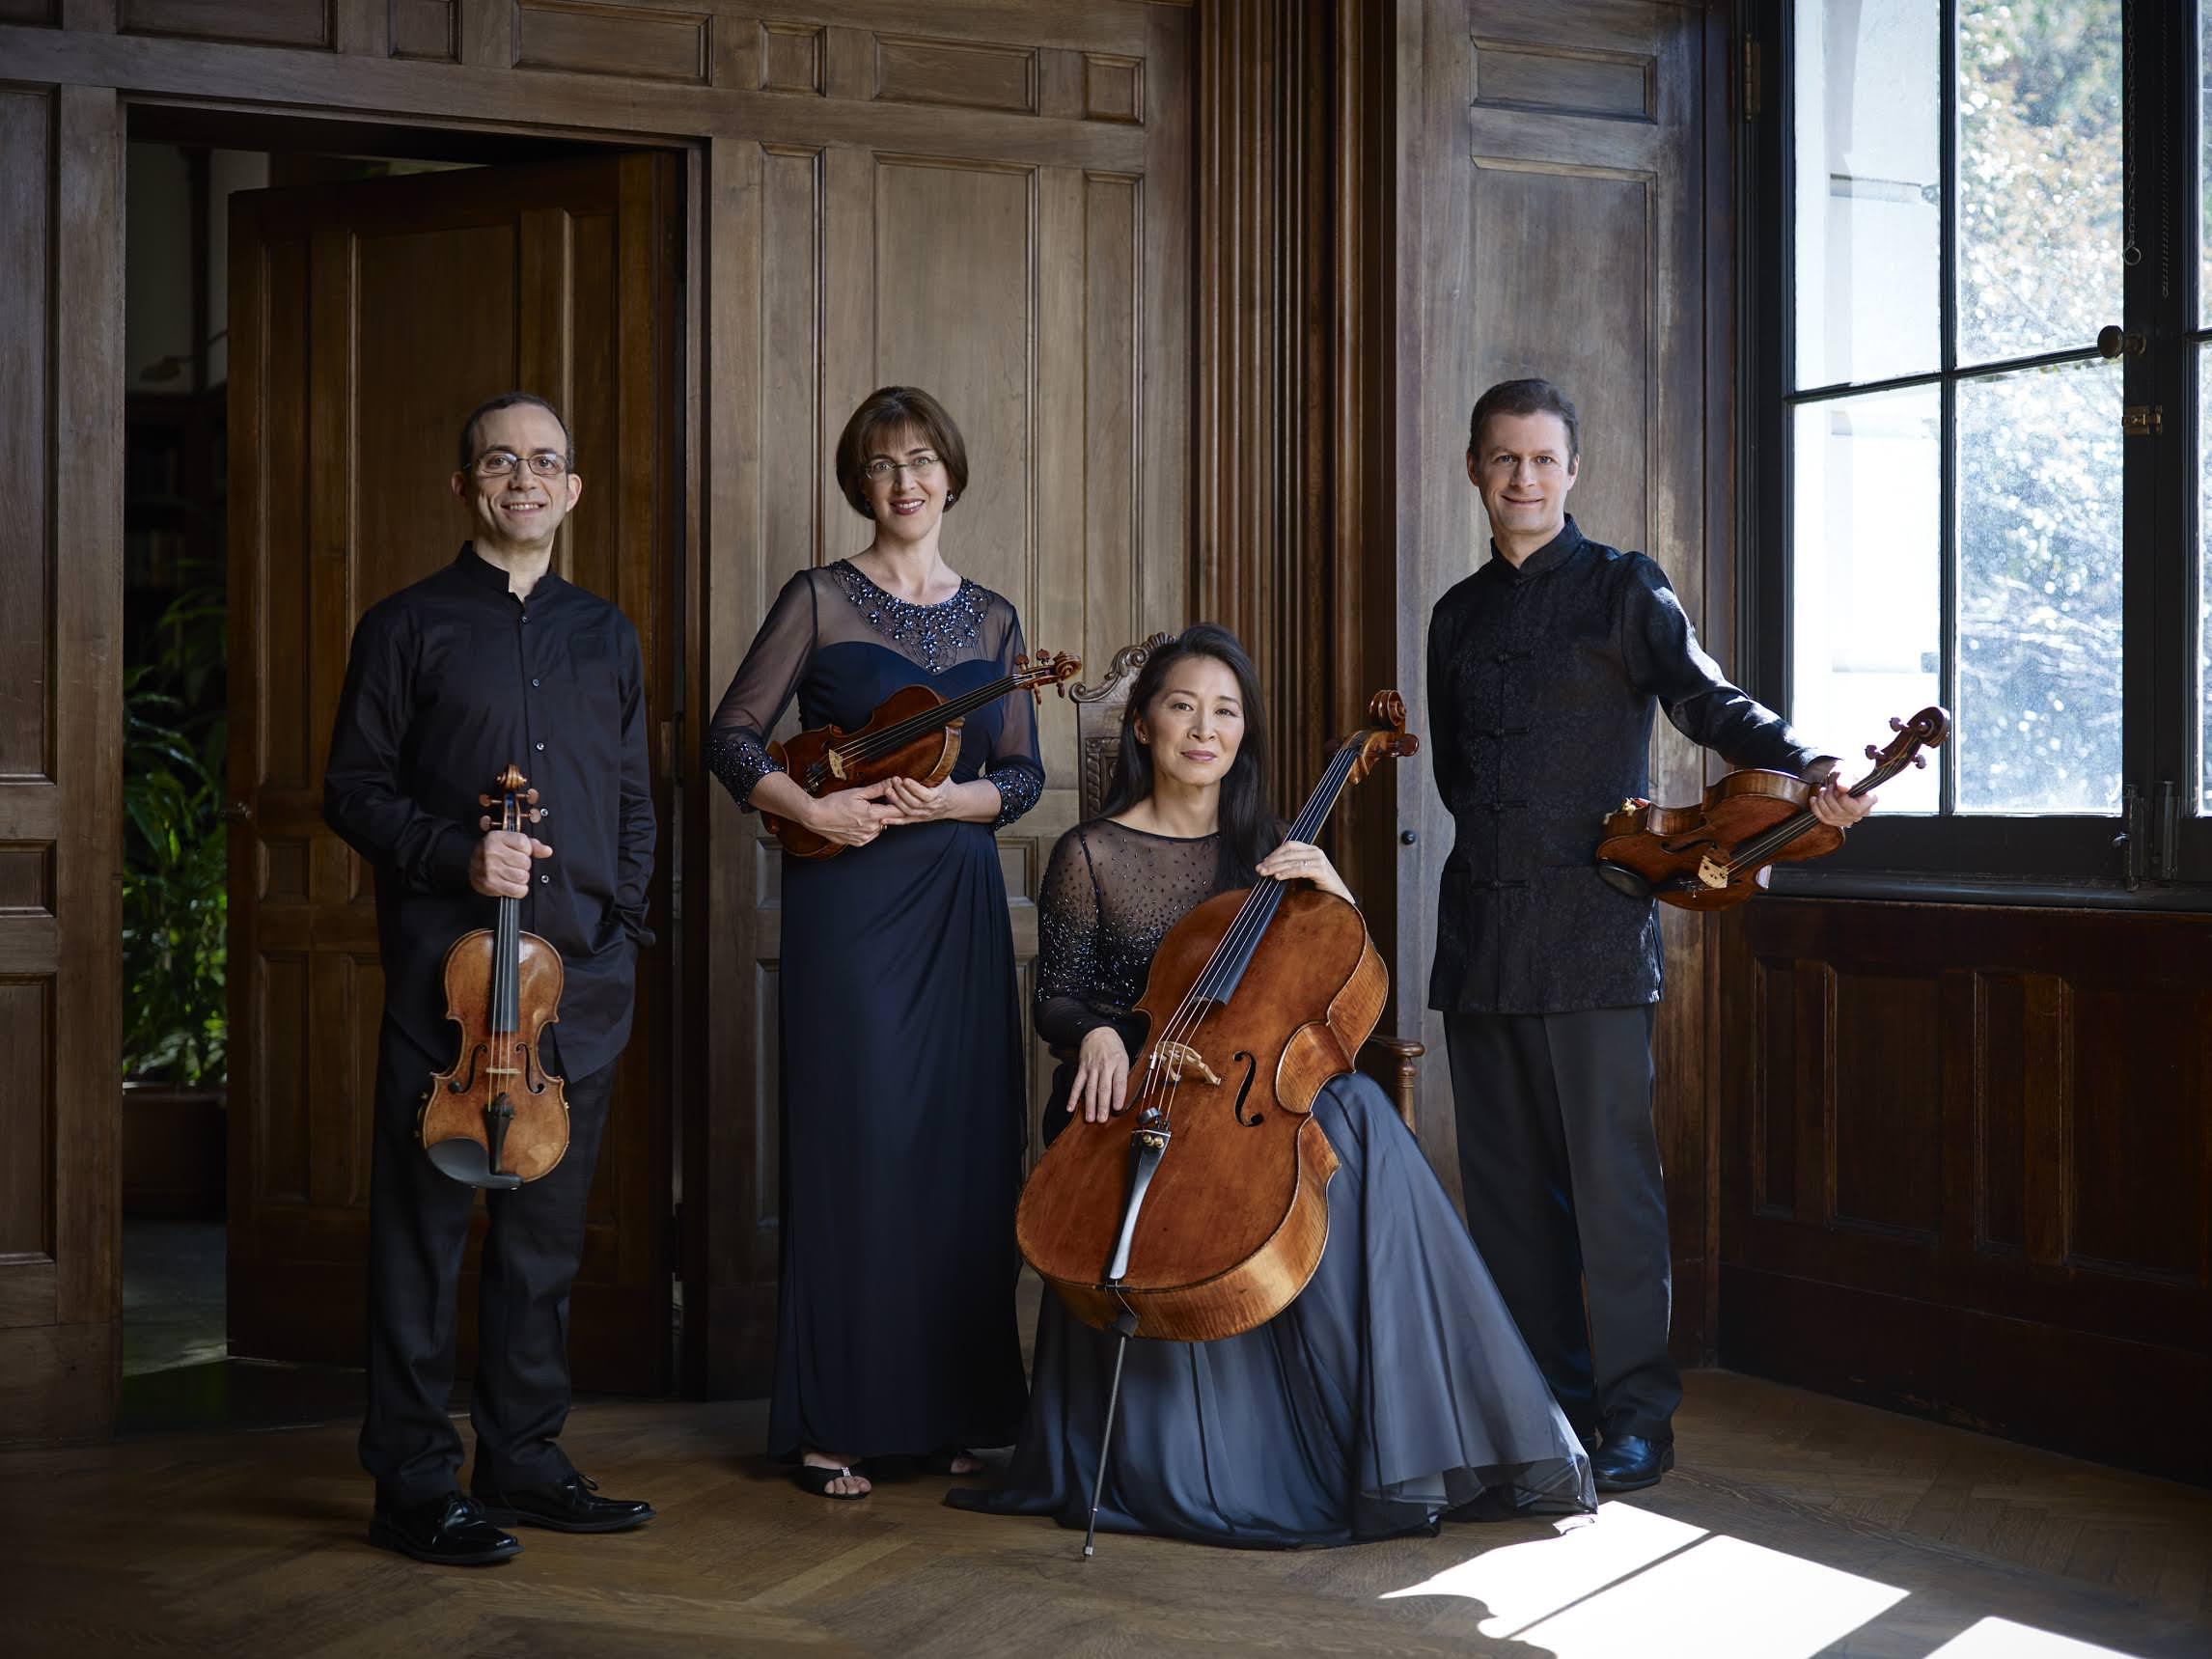 brentano-quartet-by-juergen-frank-2016-12.jpg